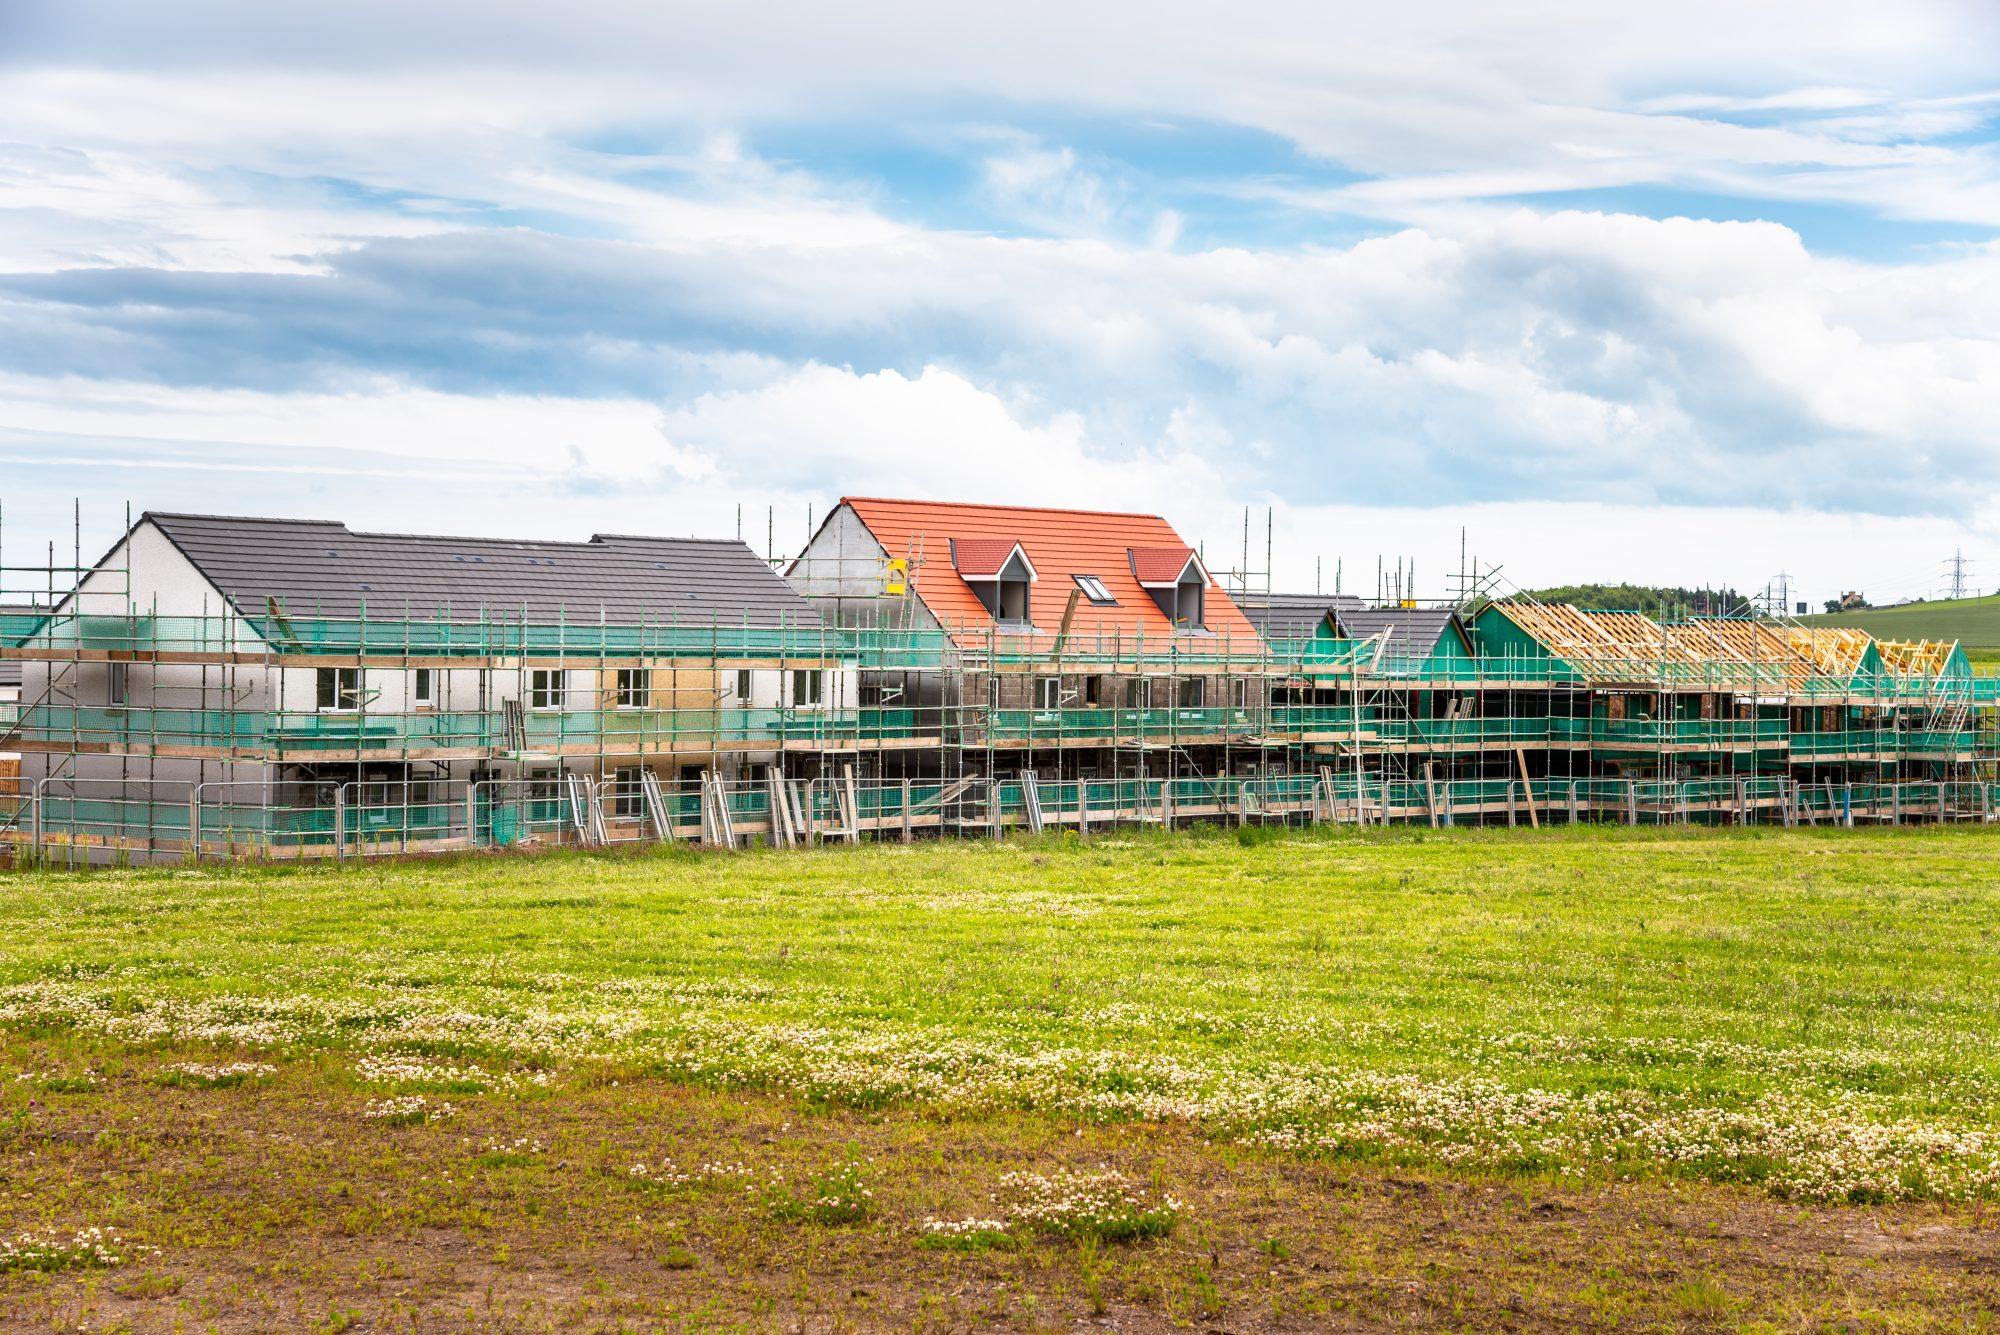 ABC+ tackles rural Scotland